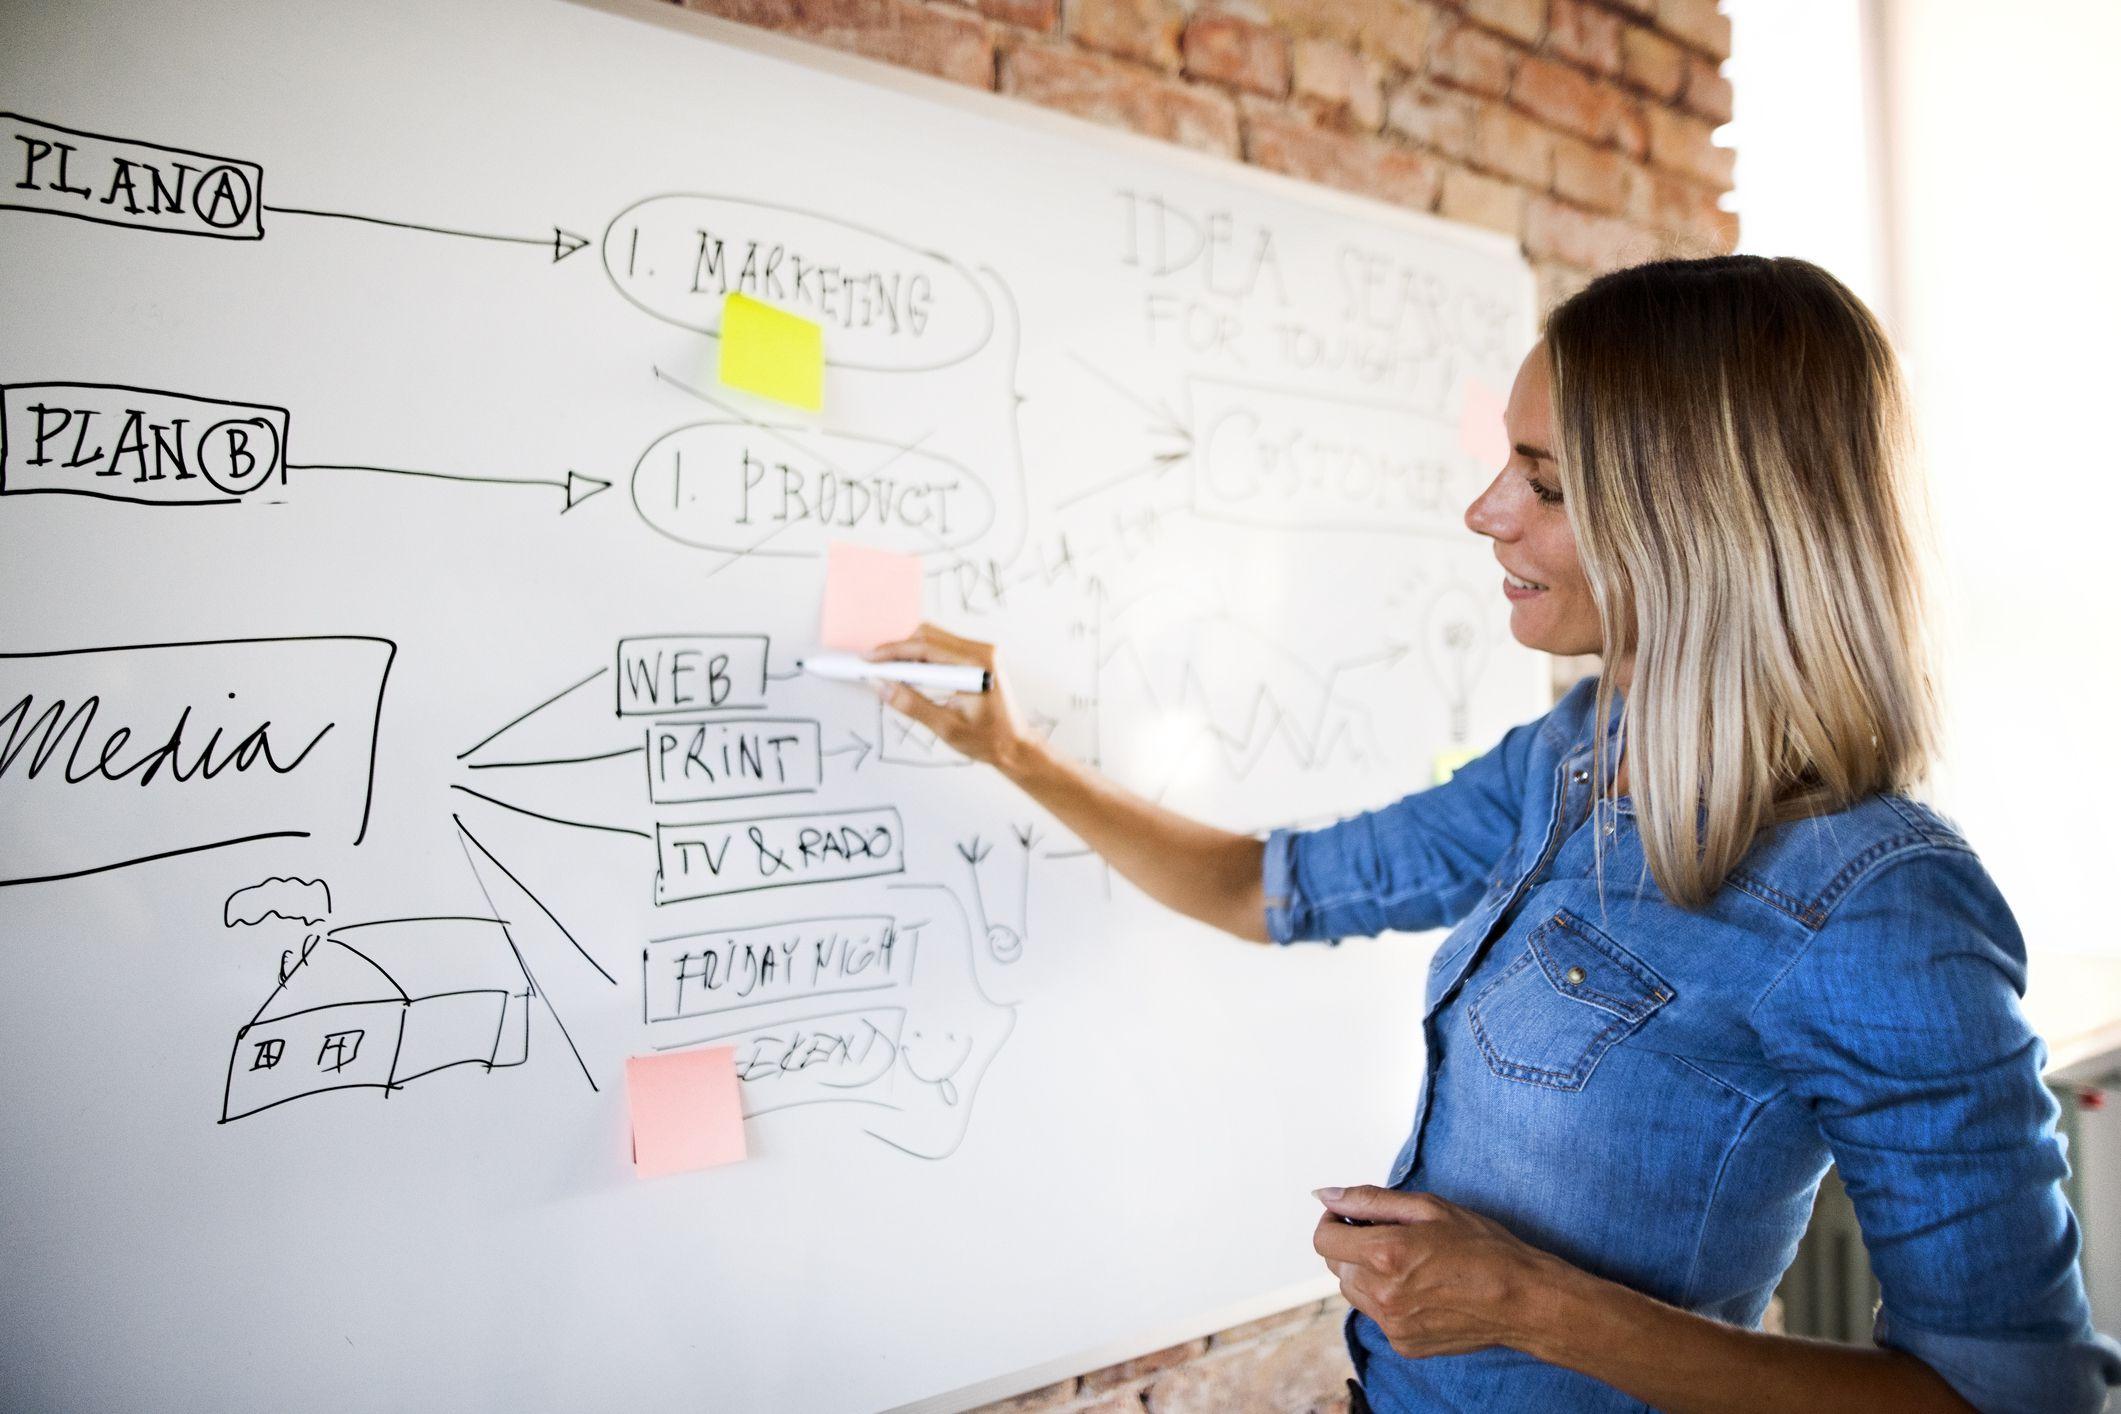 Brainstorming Techniques For Entrepreneurs